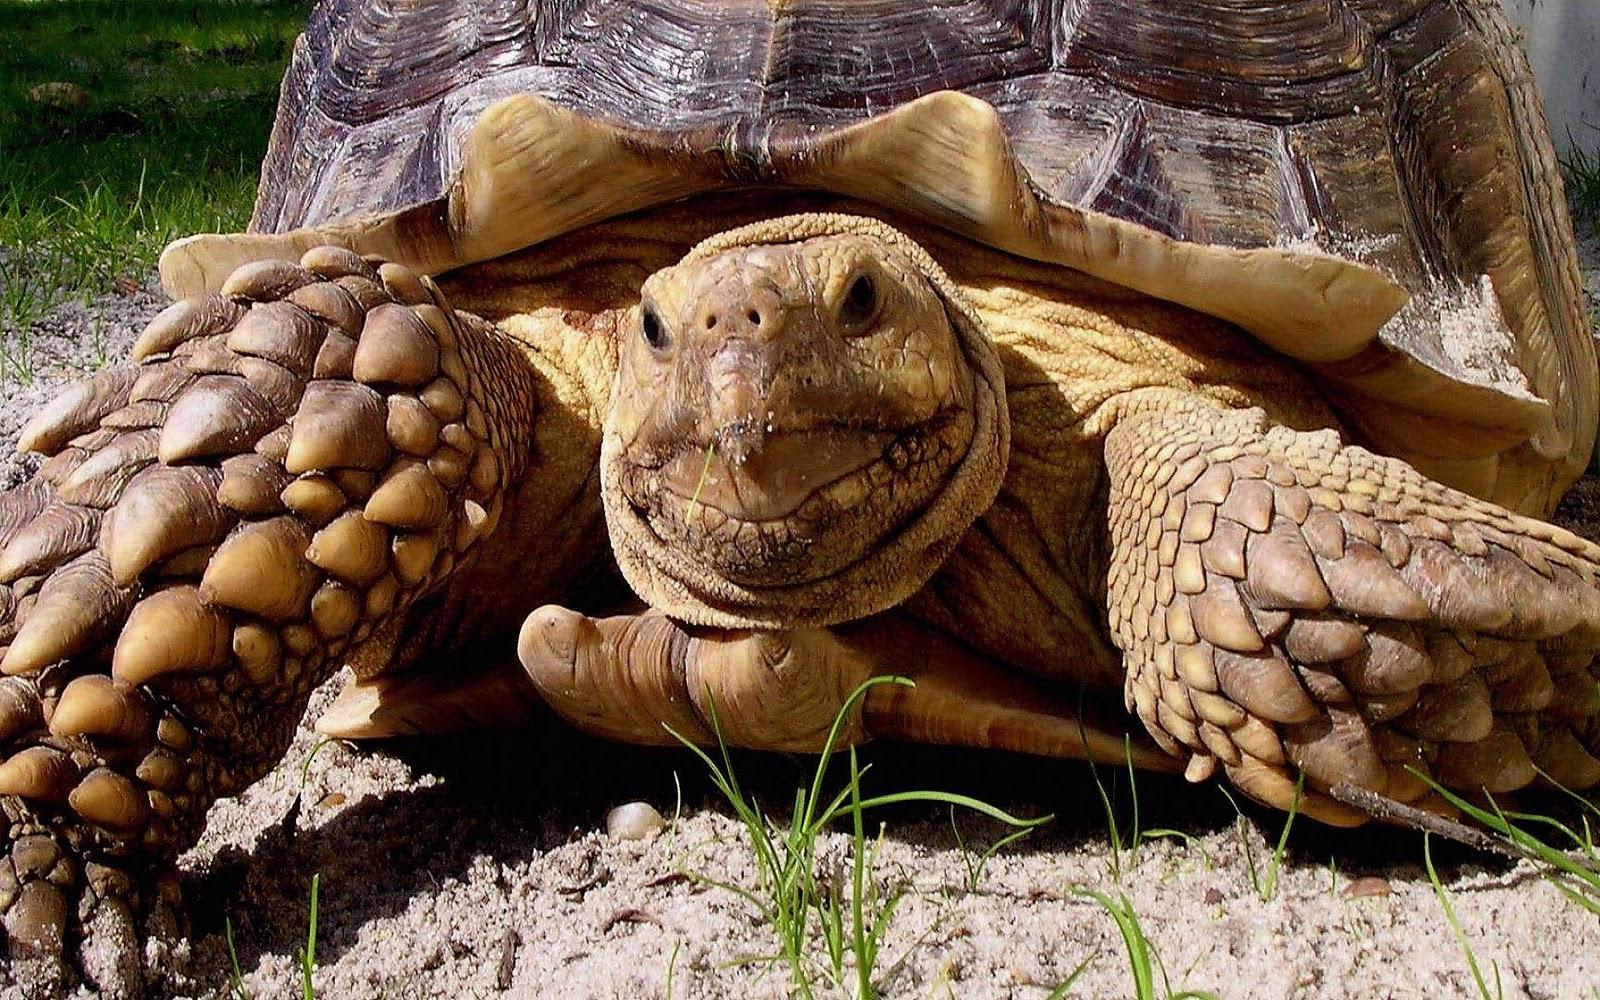 http://3.bp.blogspot.com/-_nNtPydA81c/TyAajNRGFxI/AAAAAAAAXvc/REYfwoooFTQ/s1600/Schildpadden-achtergronden-dieren-hd-schildpad-wallpapers-foto-2.jpg